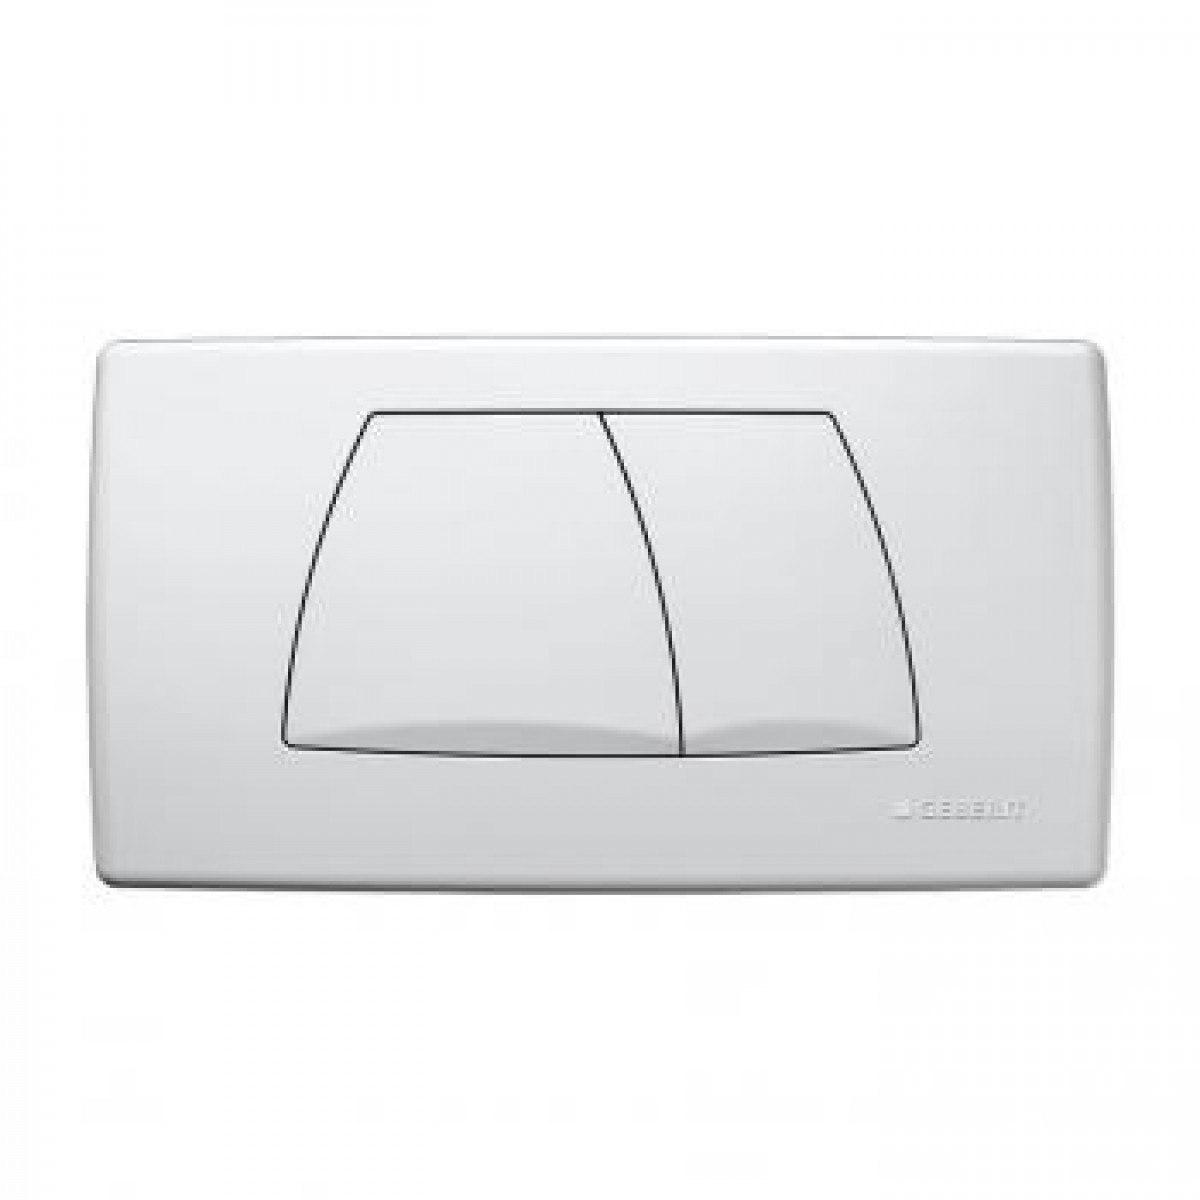 Geberit 115 888 1 Twinline Dual Flush Actuator Plate